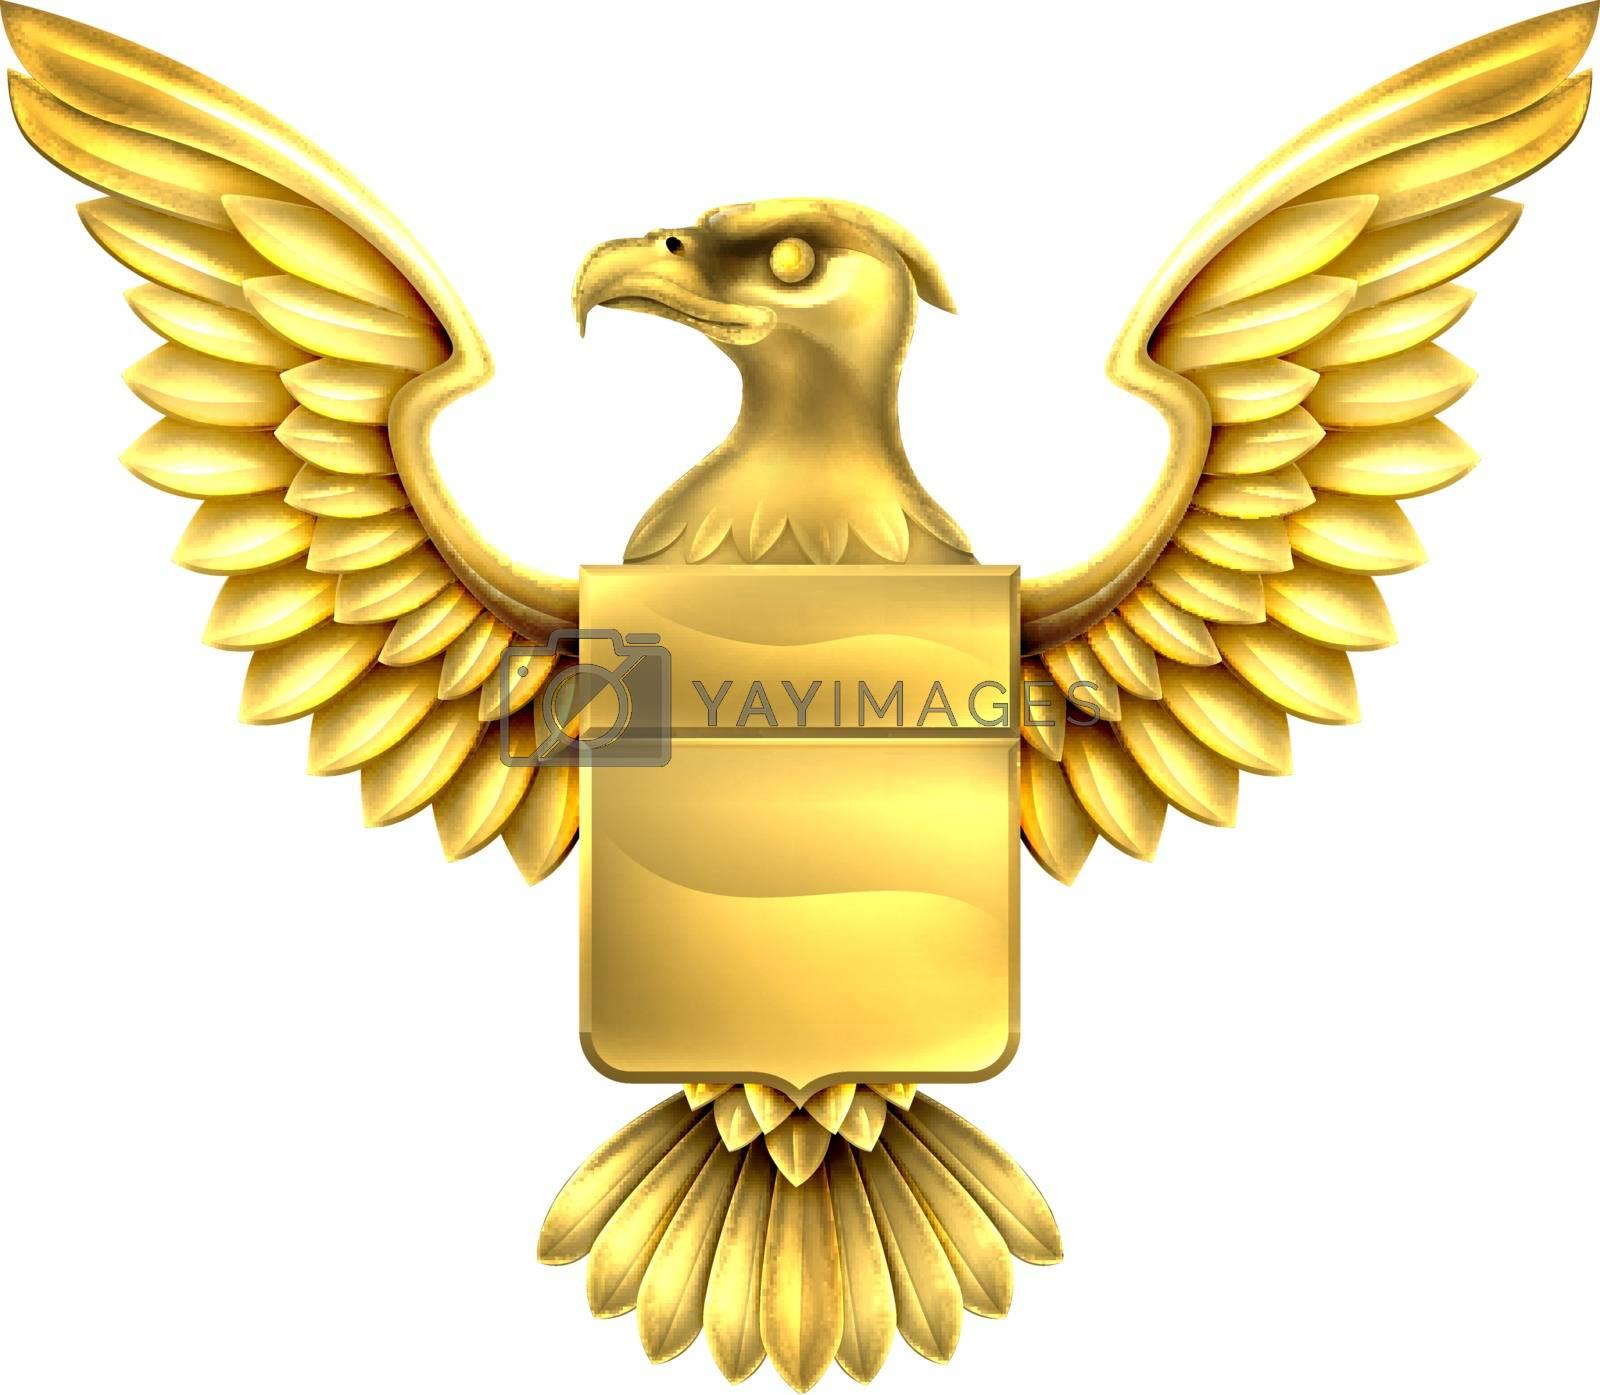 An eagle golden metal shield heraldic heraldry coat of arms design.